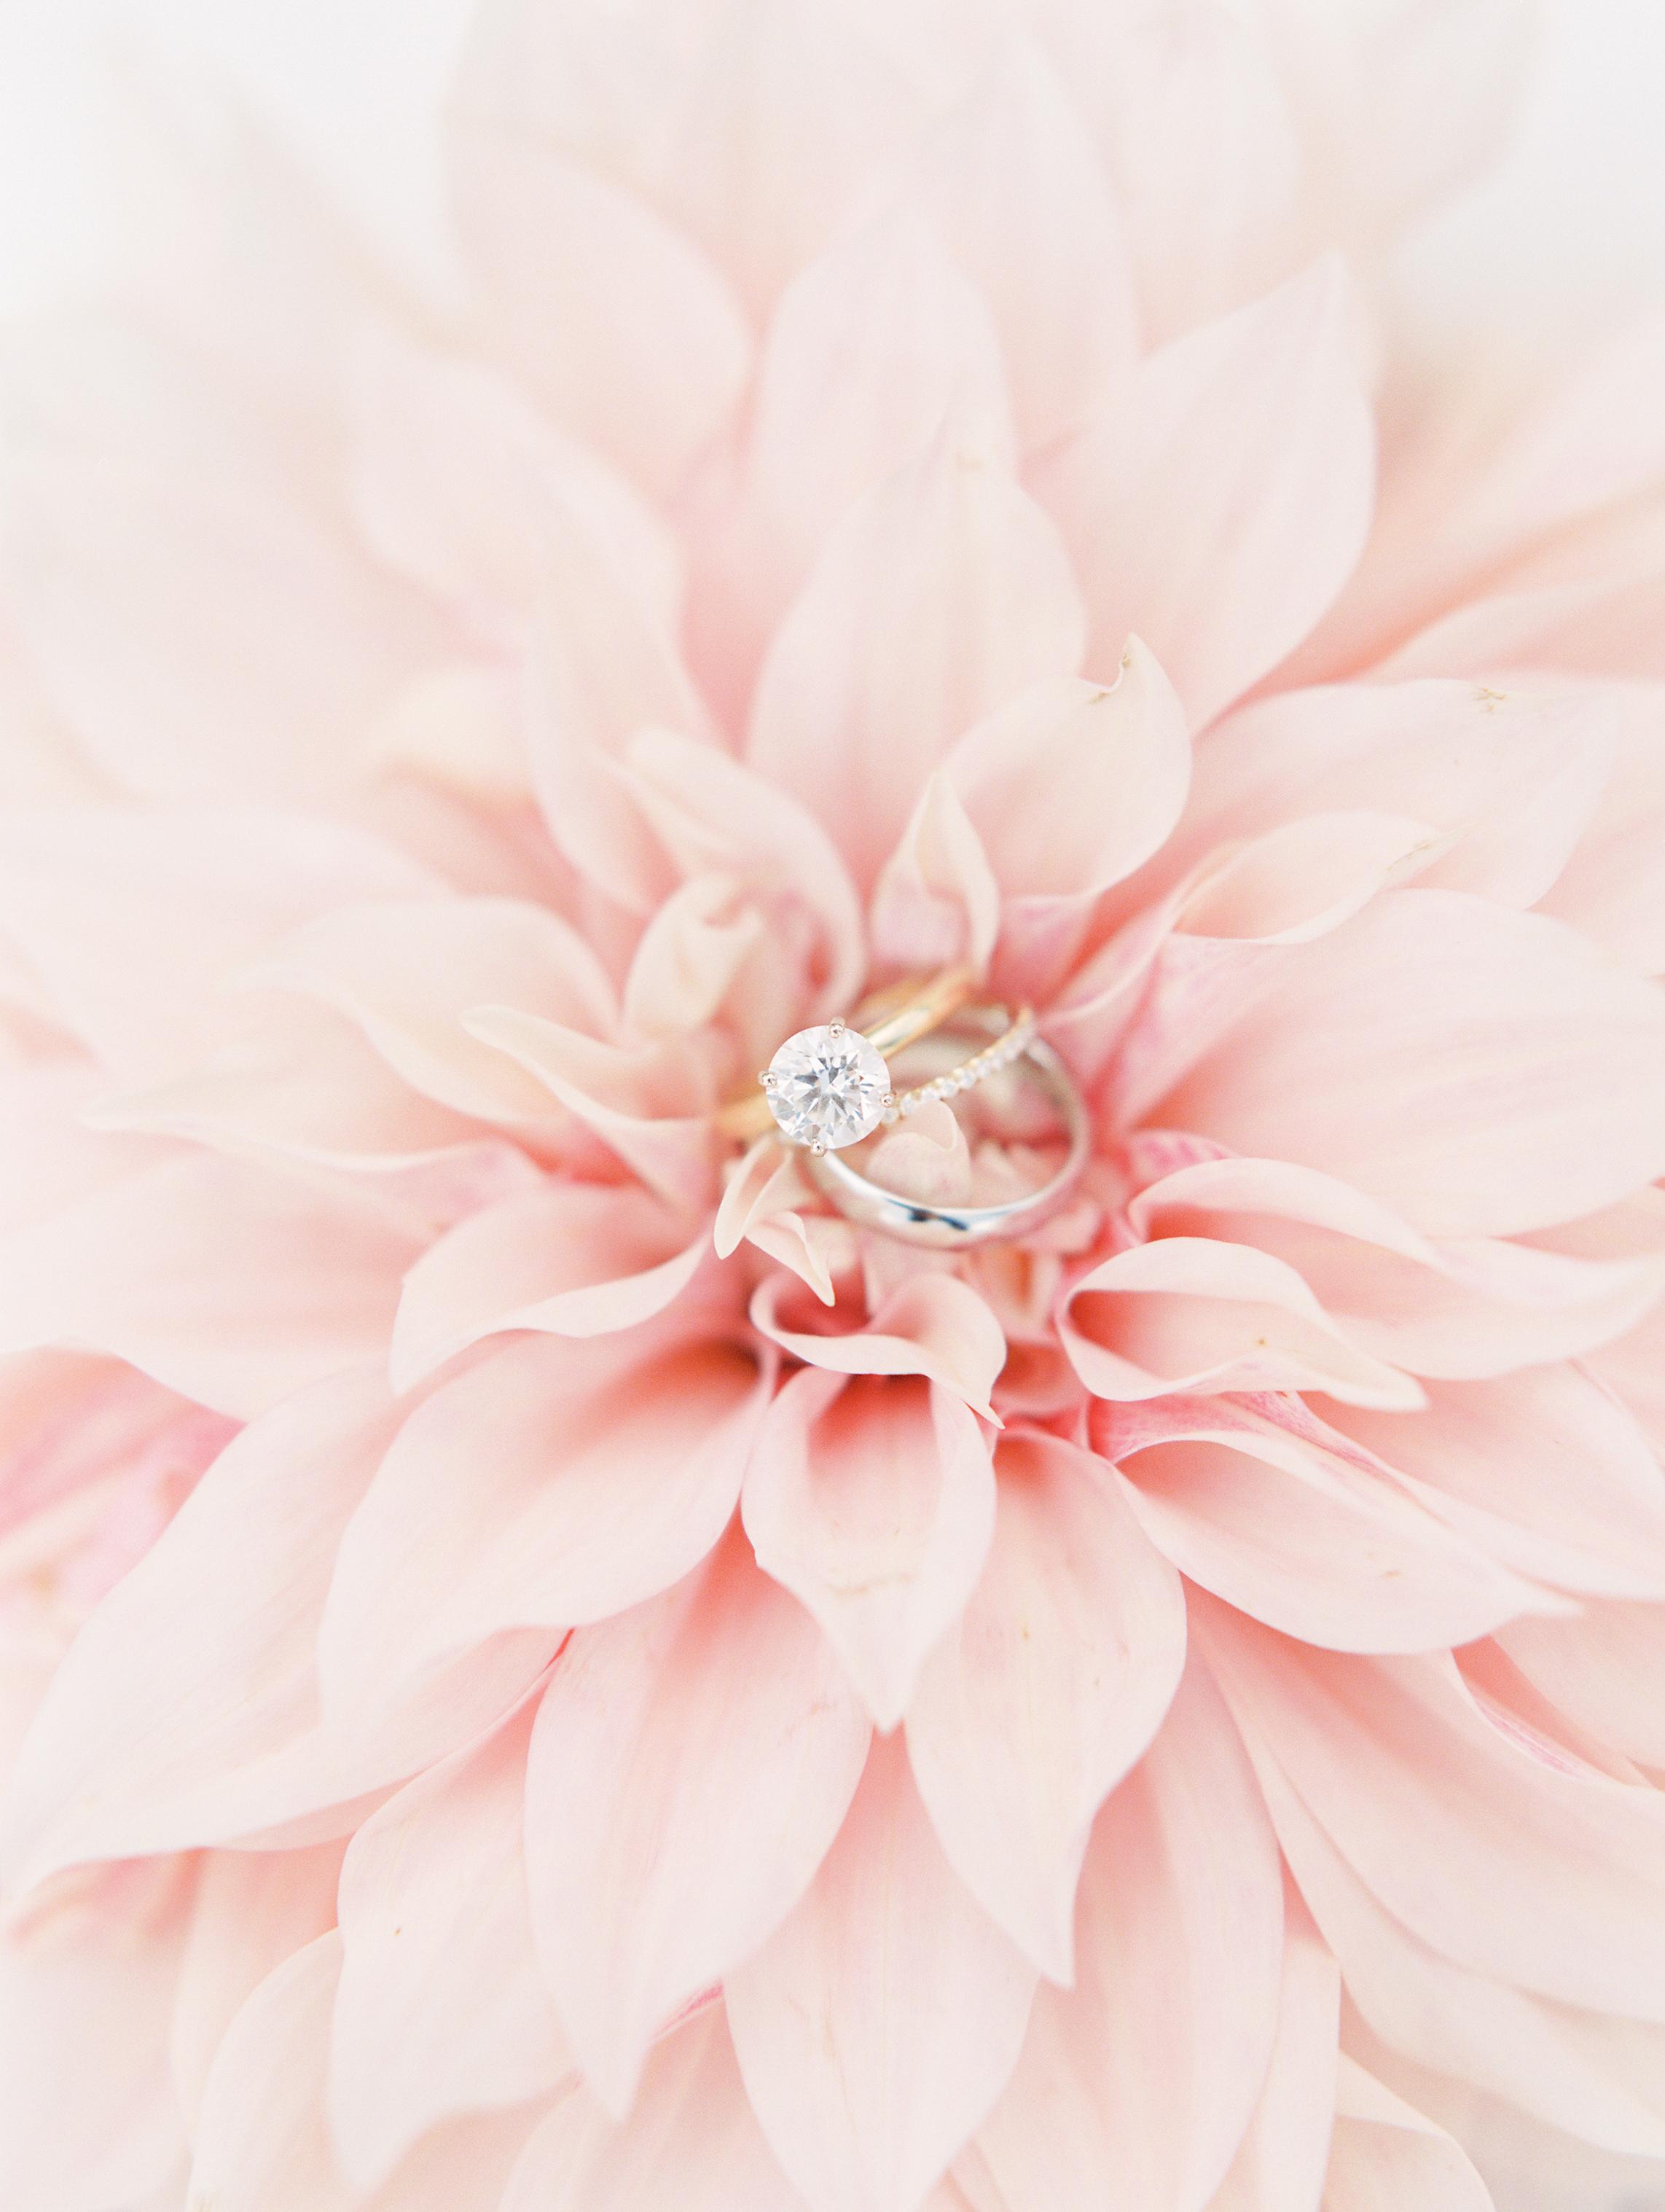 Zoller+Wedding+Details-37.jpg